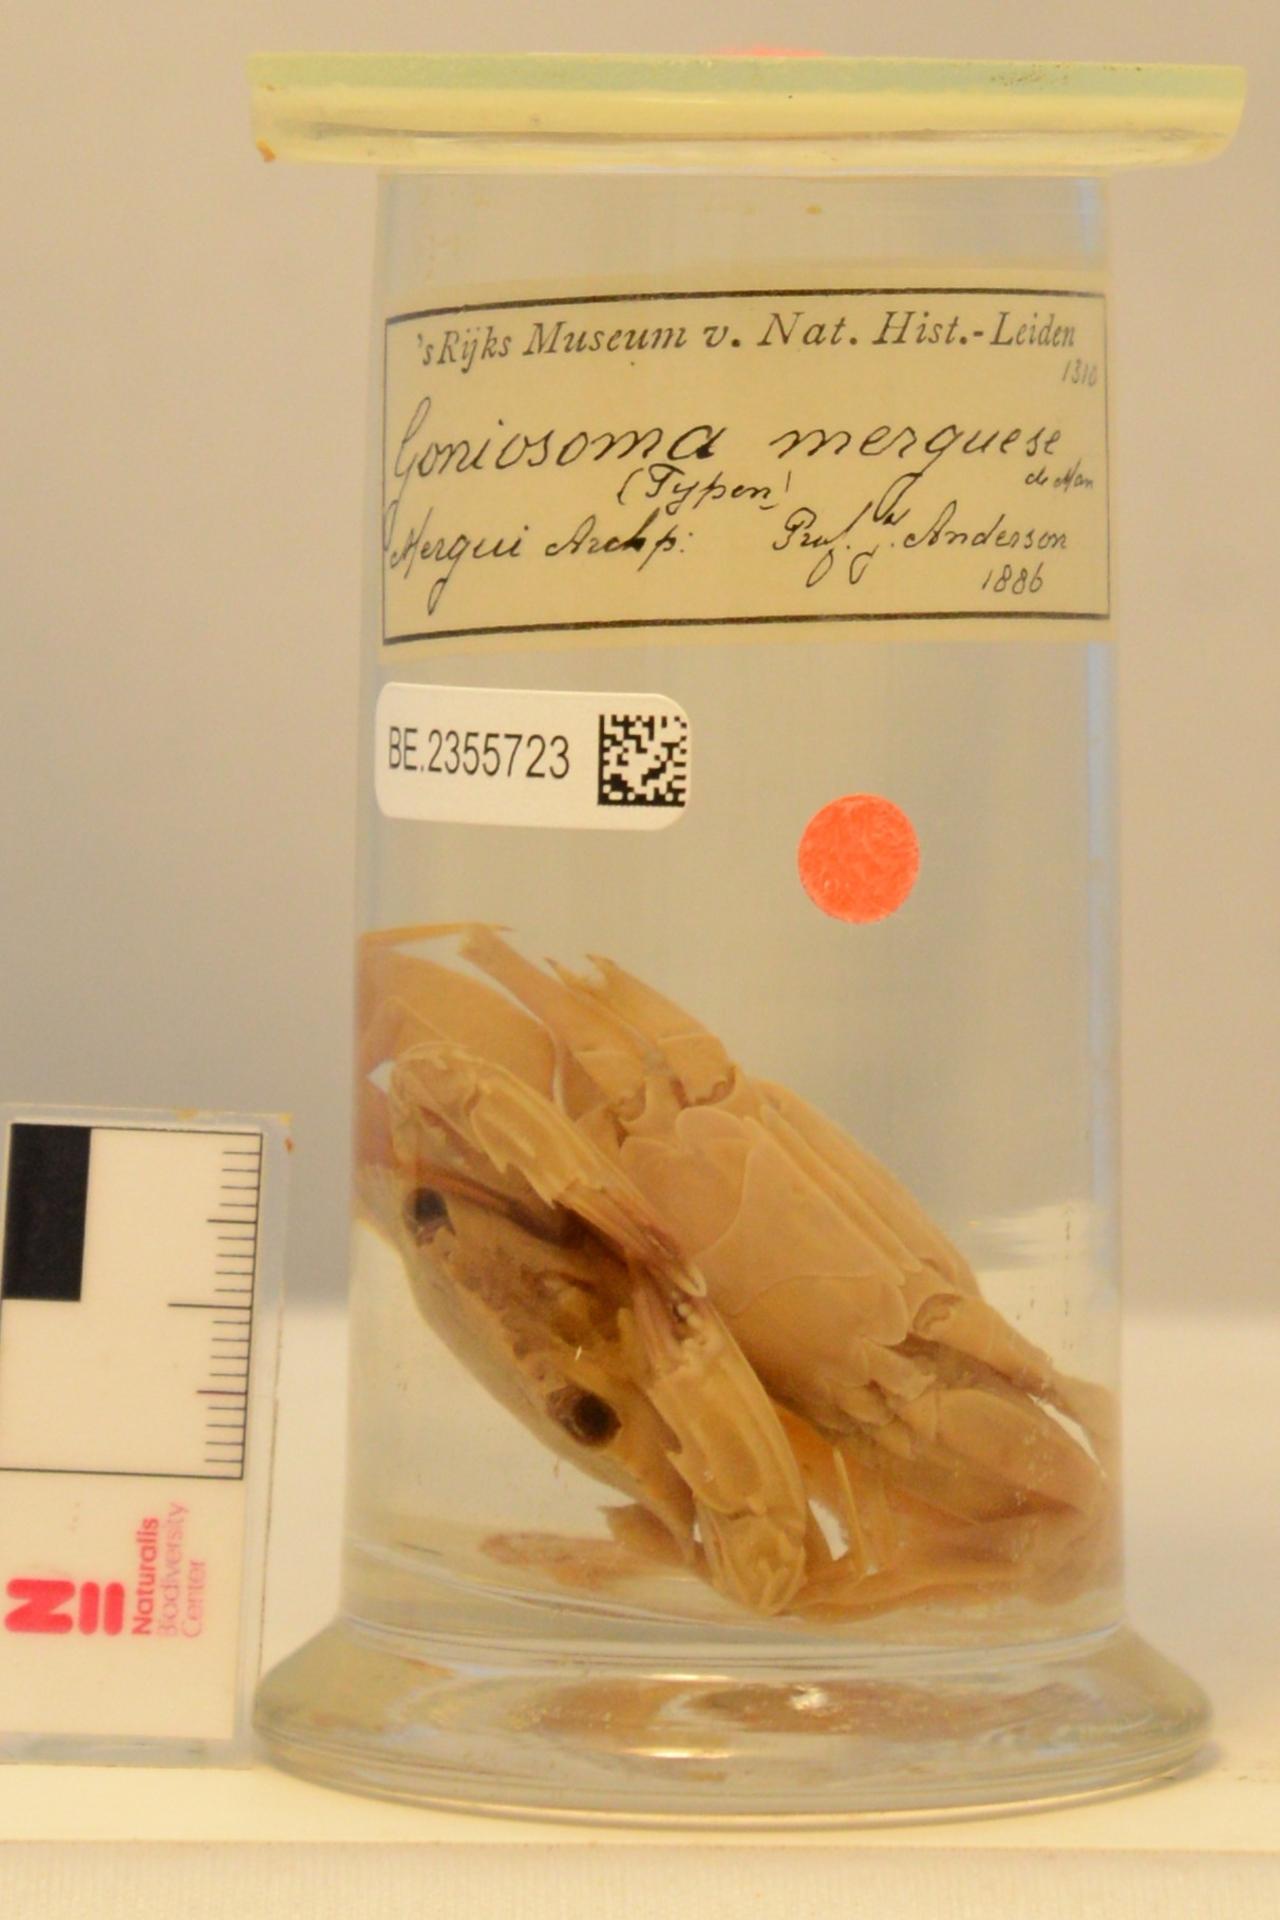 RMNH.CRUS.D.1310 | Charybdis (Charybdis) helleri A. Milne Edwards, 1867